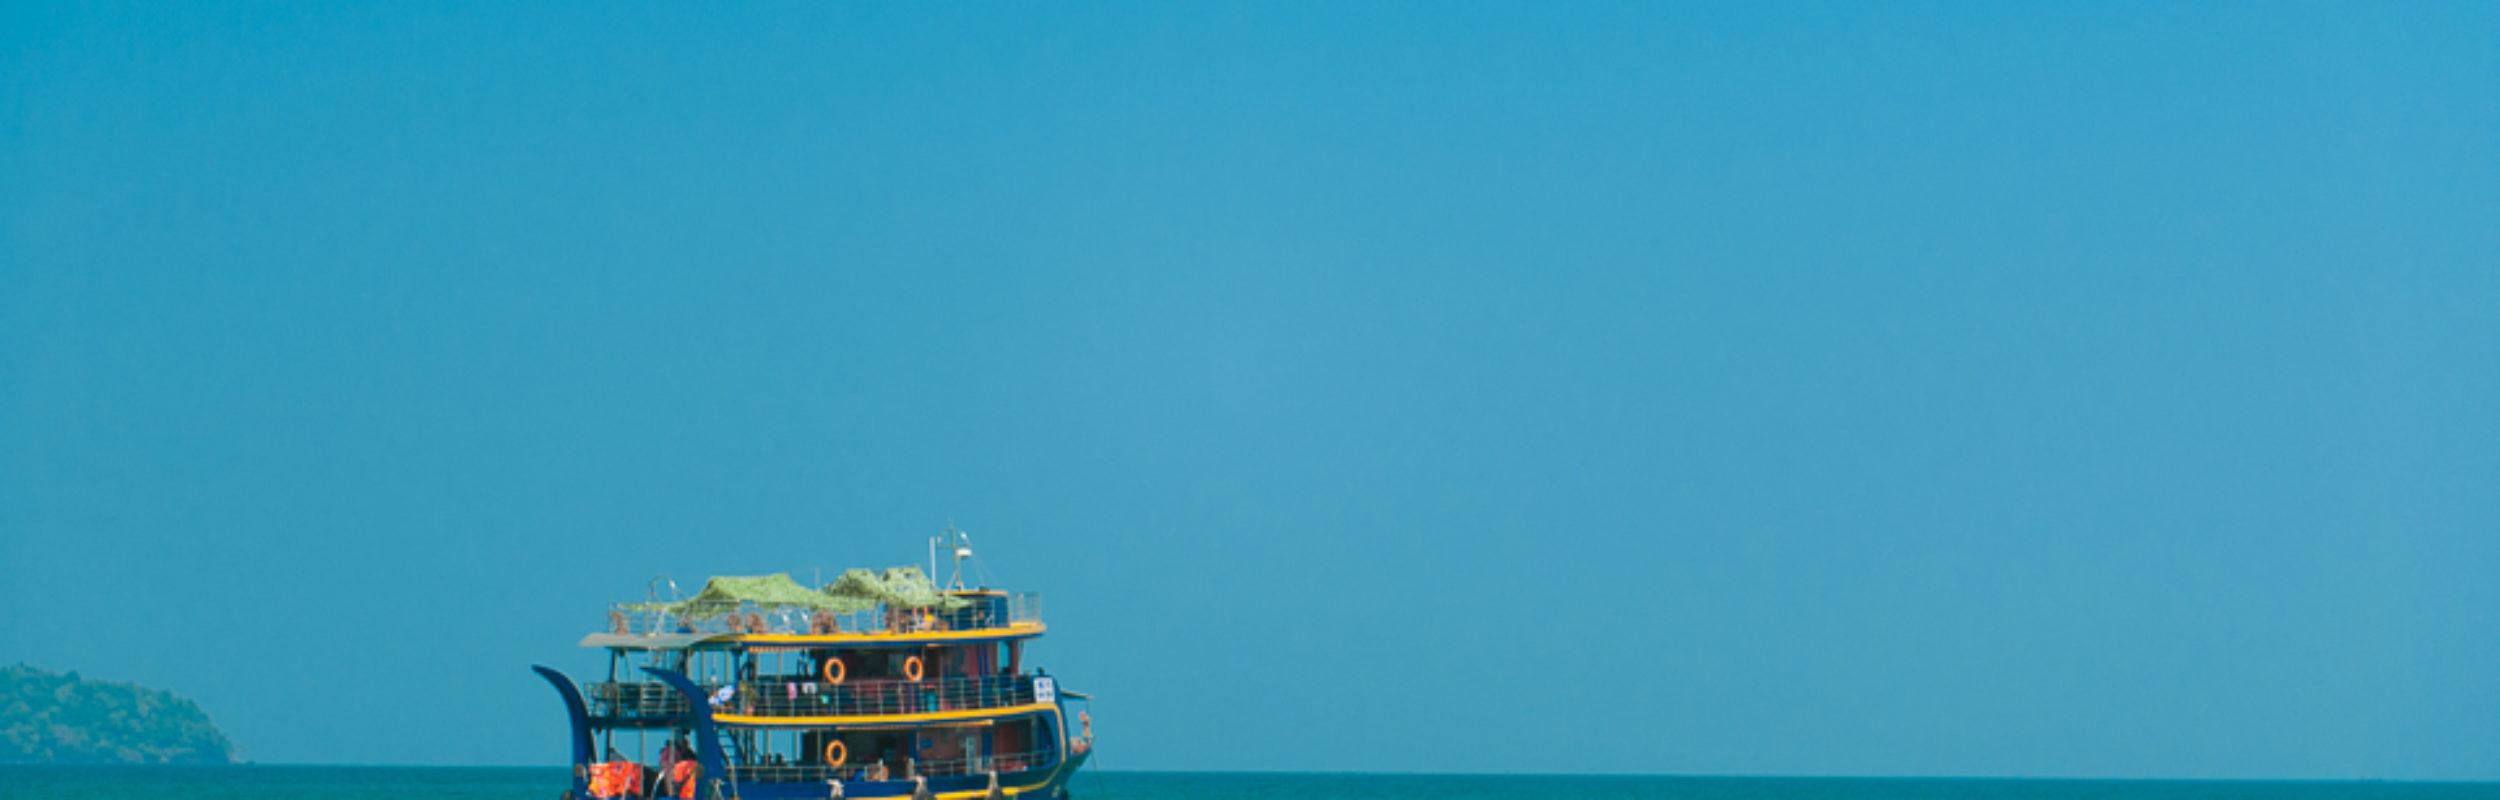 Cambodge trip : sea, farniente & sun à Sihanoukville